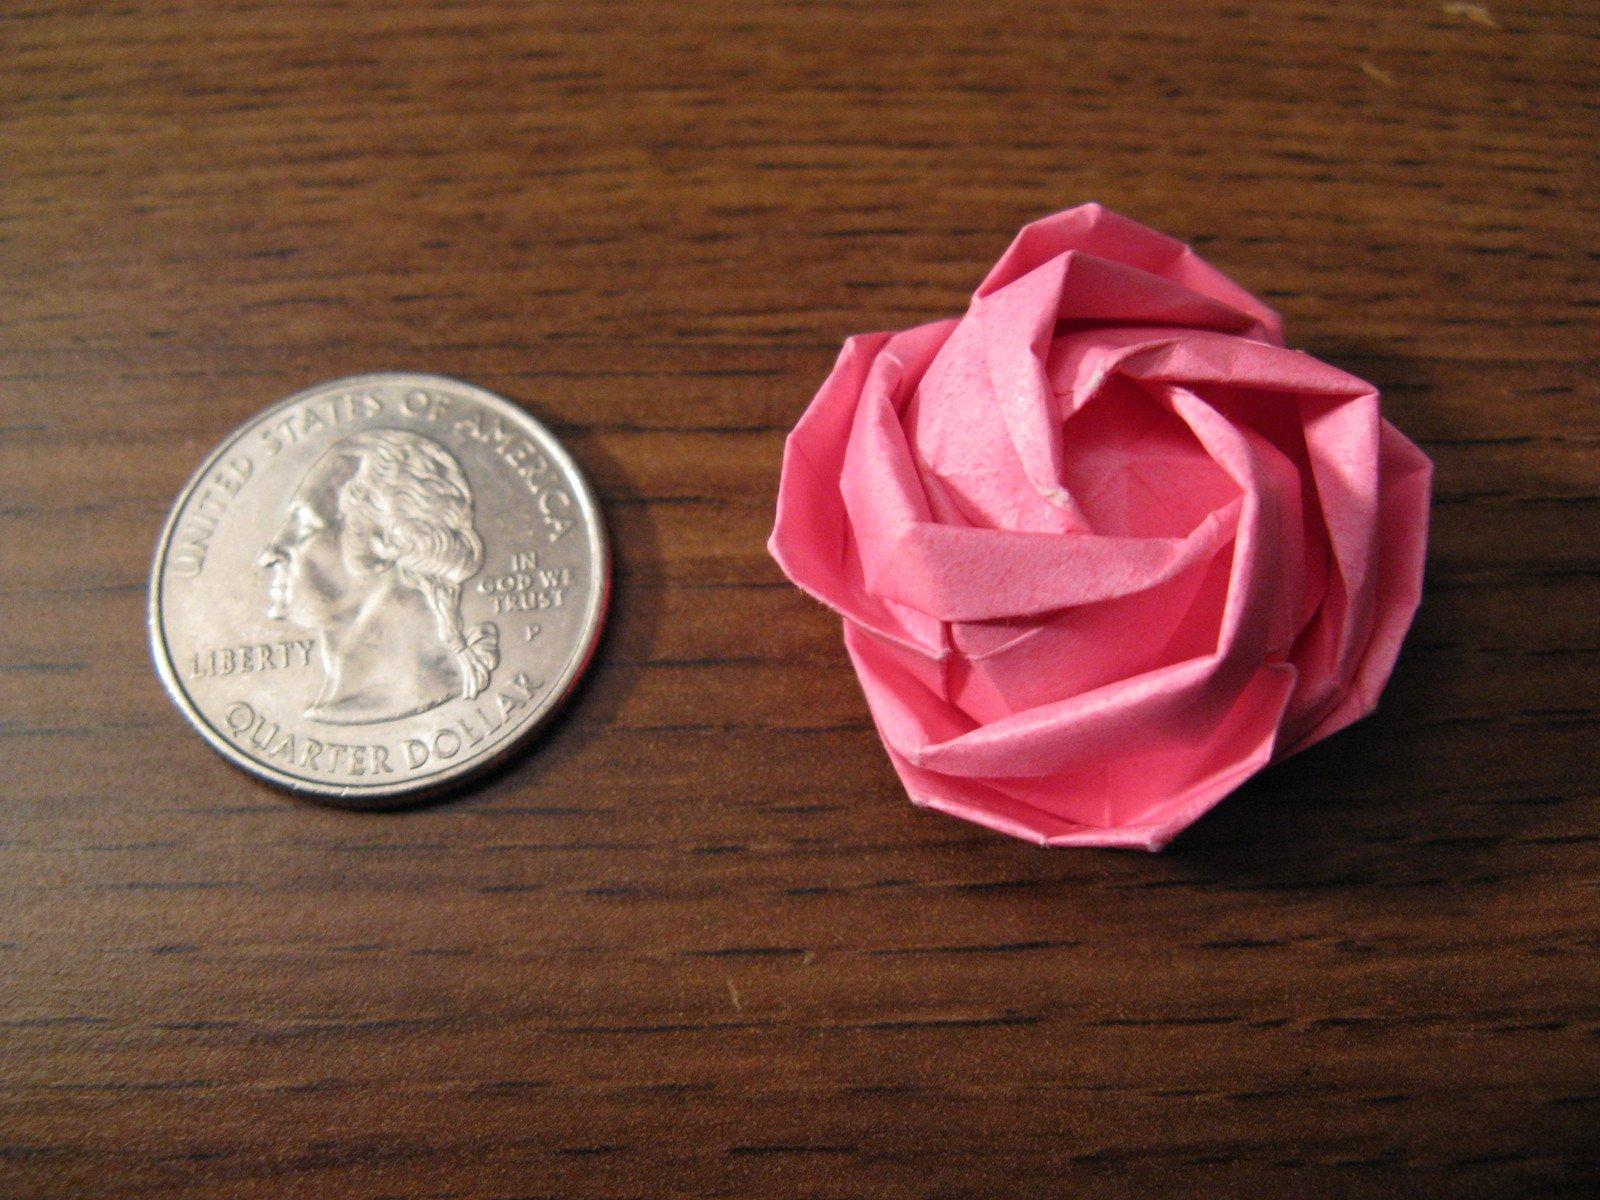 Free origami rose kawasaki stock photo freeimages free origami rose kawasaki stock photo mightylinksfo